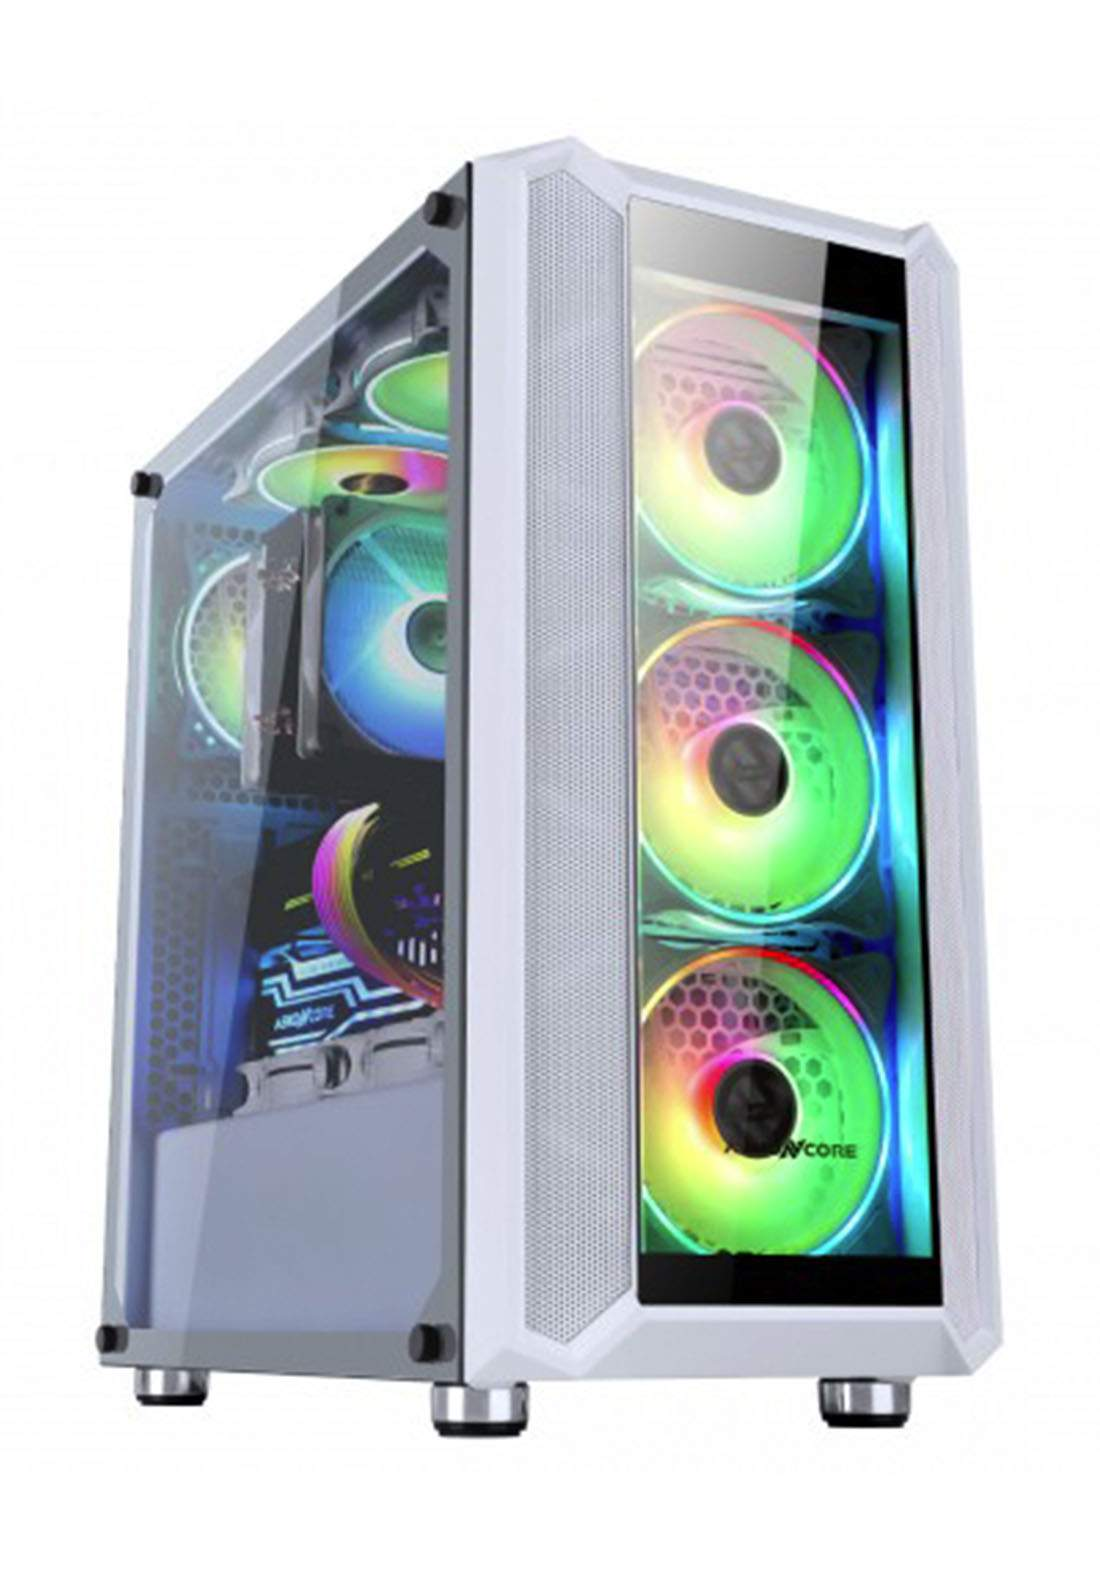 Abkoncore H301G White Rgb MID Tower Case - White  كيس حاسبة